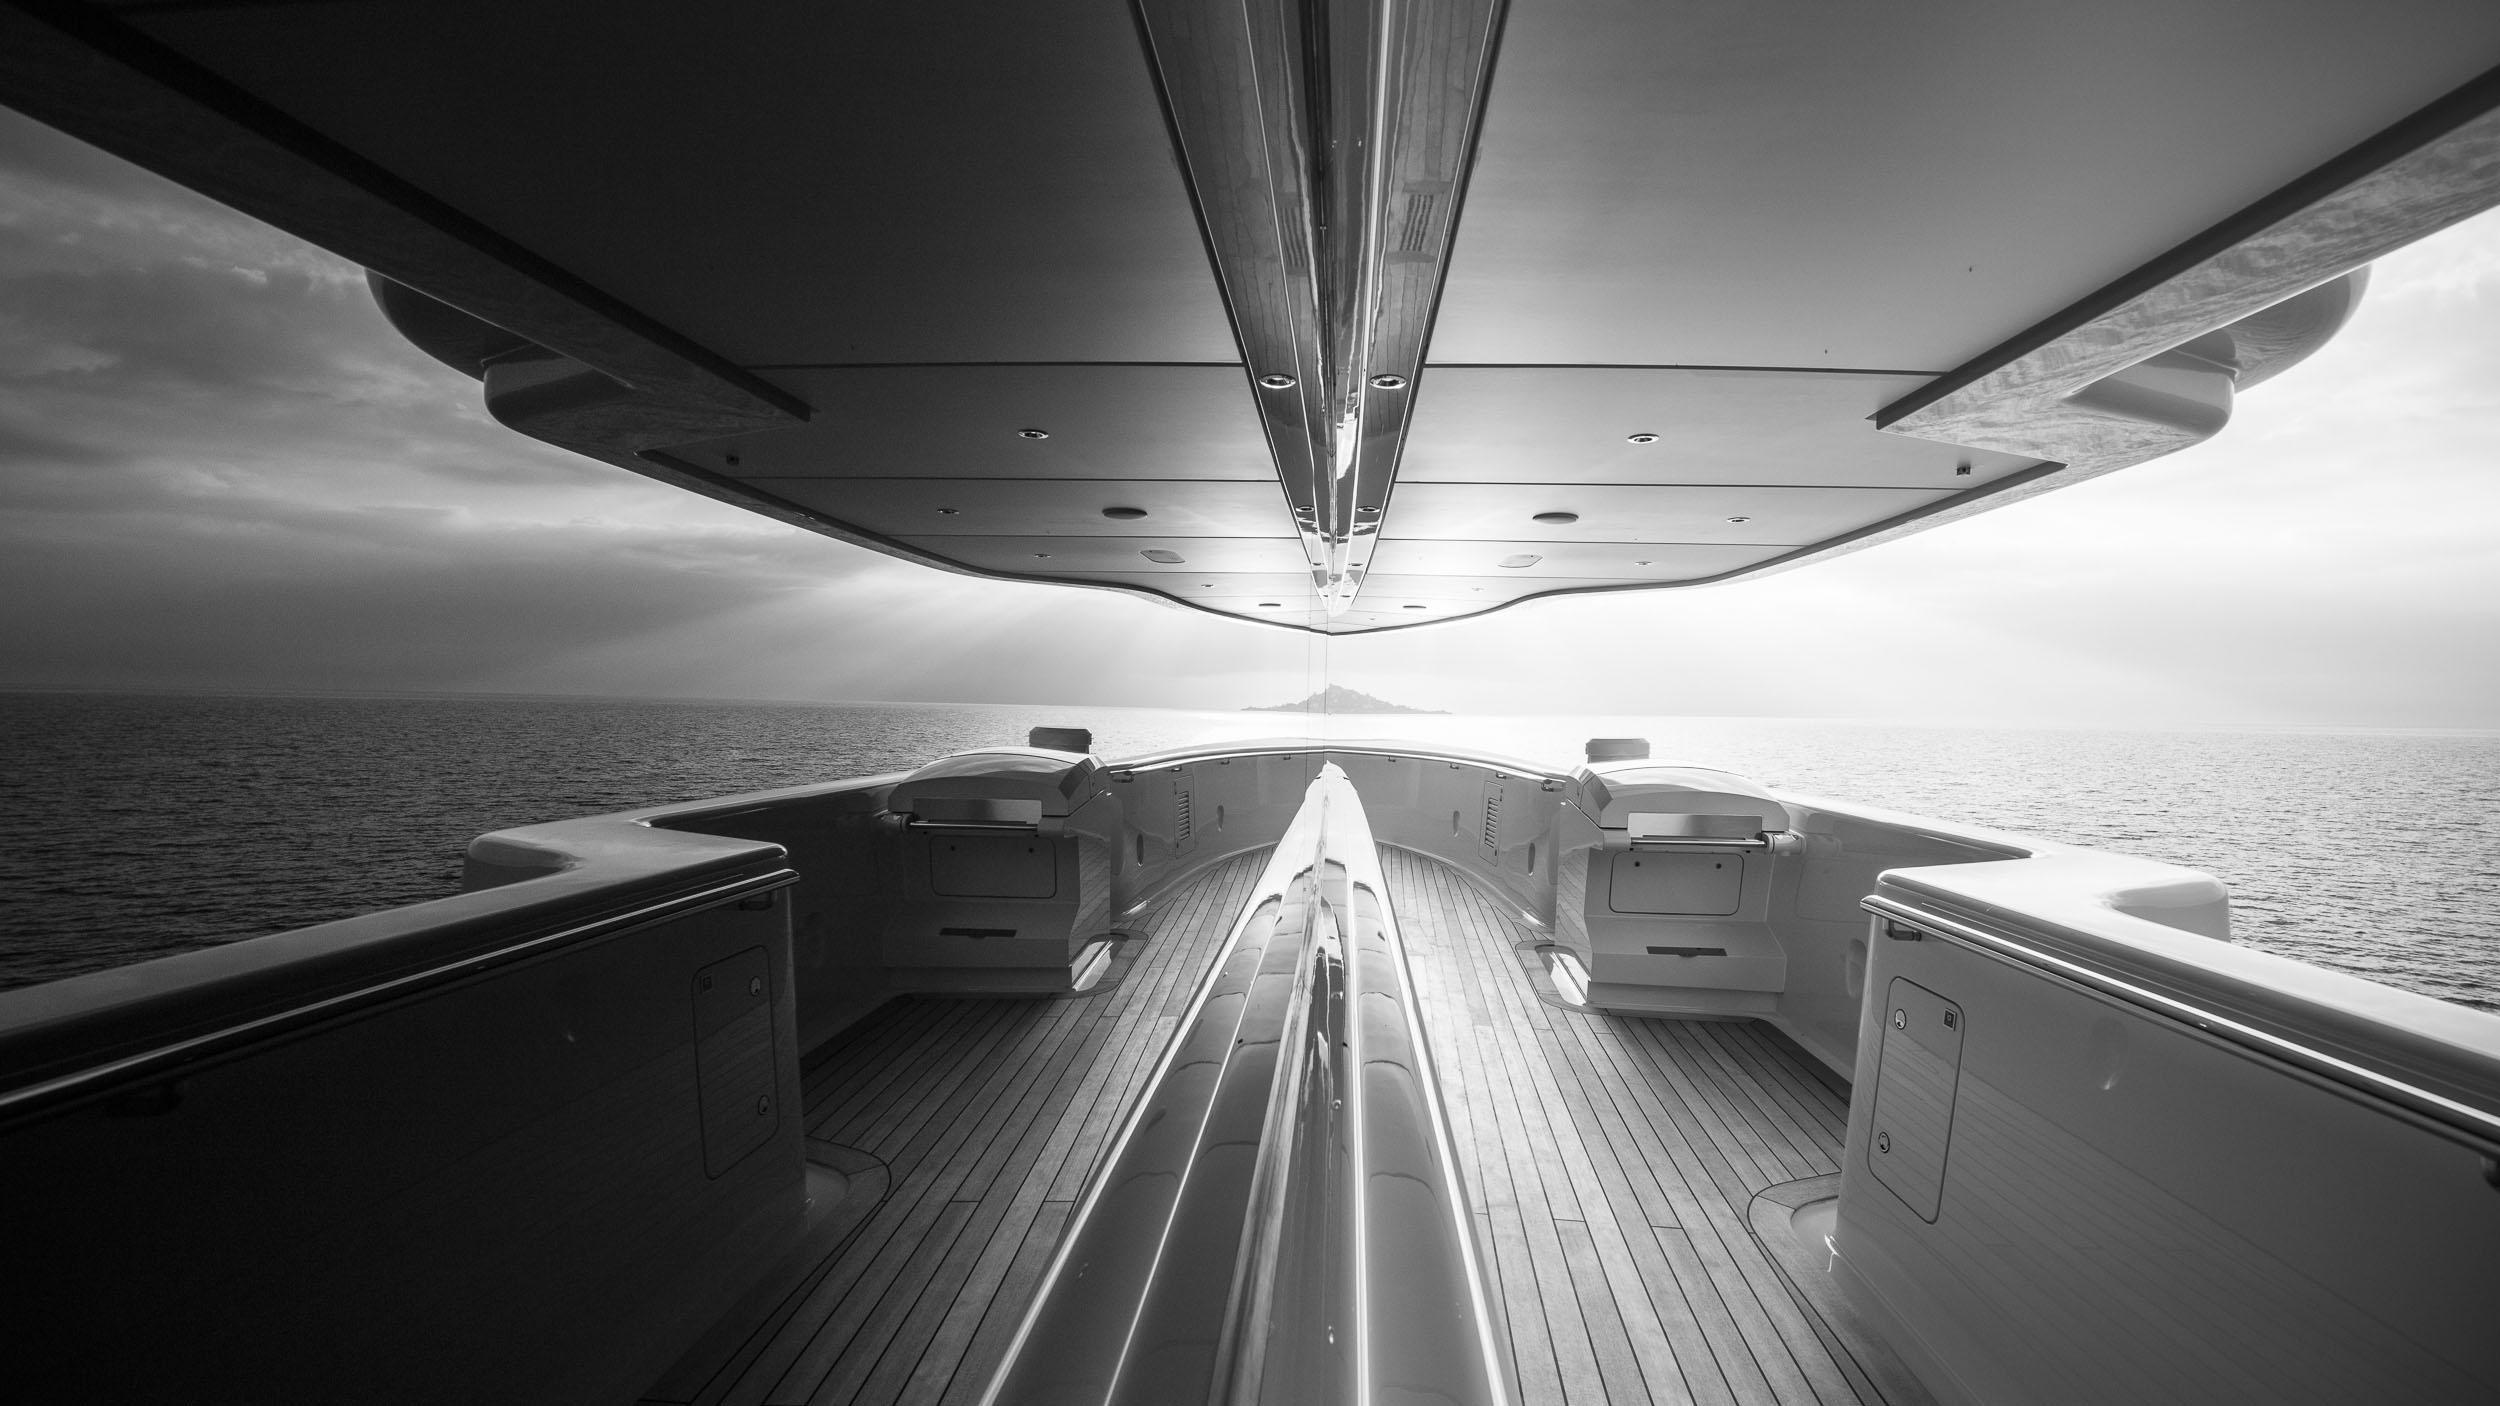 luna superyacht lloyd werft 2010 115m wheel wing